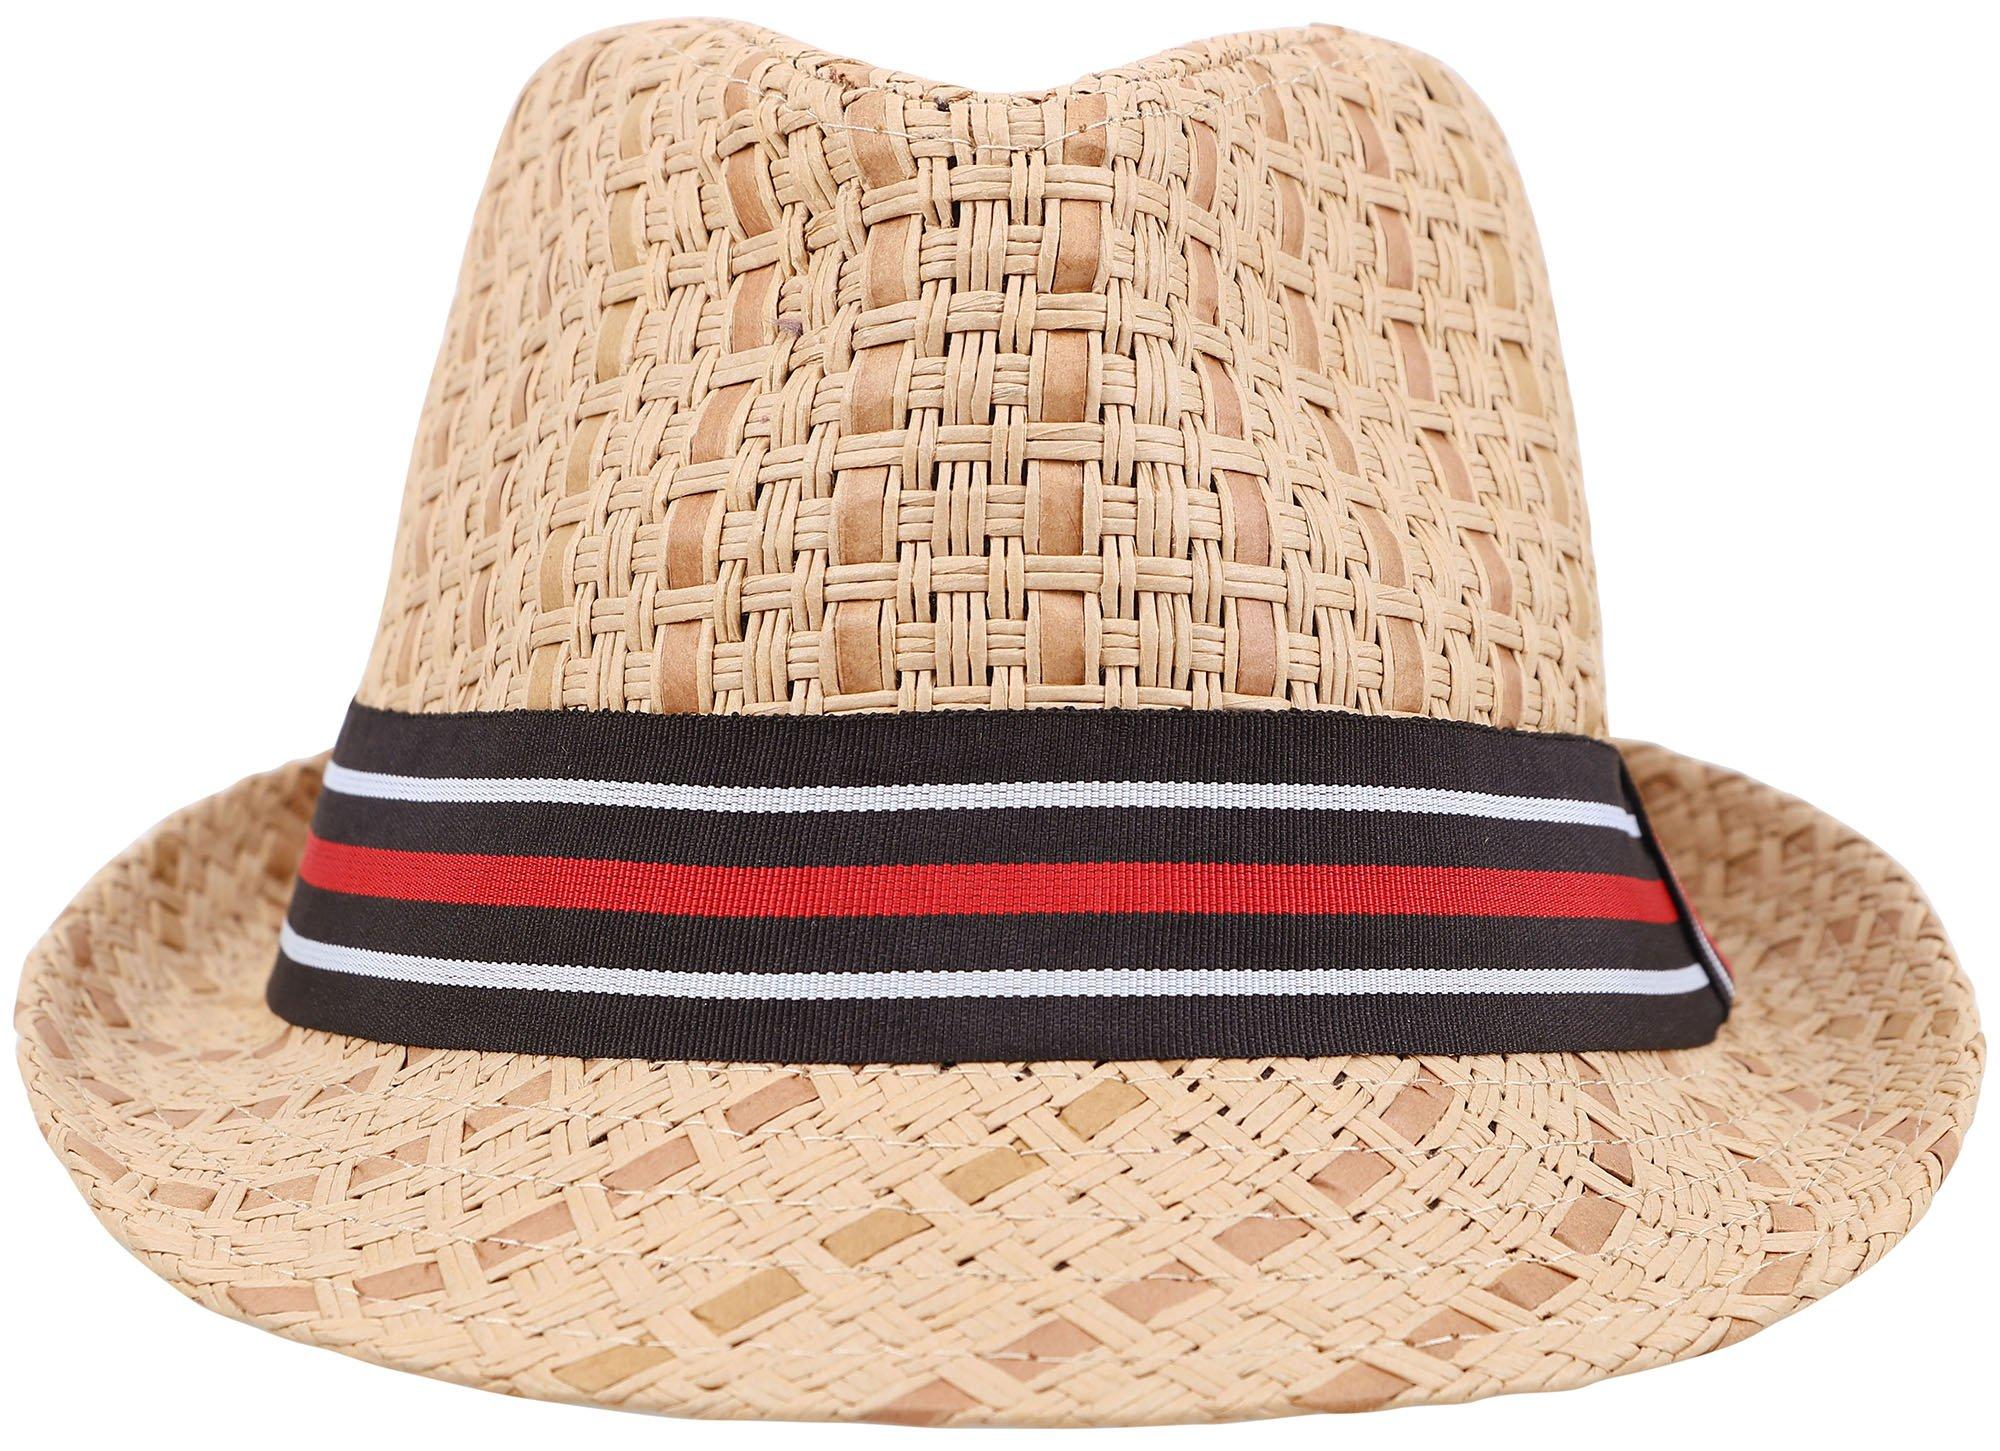 EPGU Women's Bohemian Summer Straw Fedora Hat w/Contrast Hat Band, Brown/Black LXL